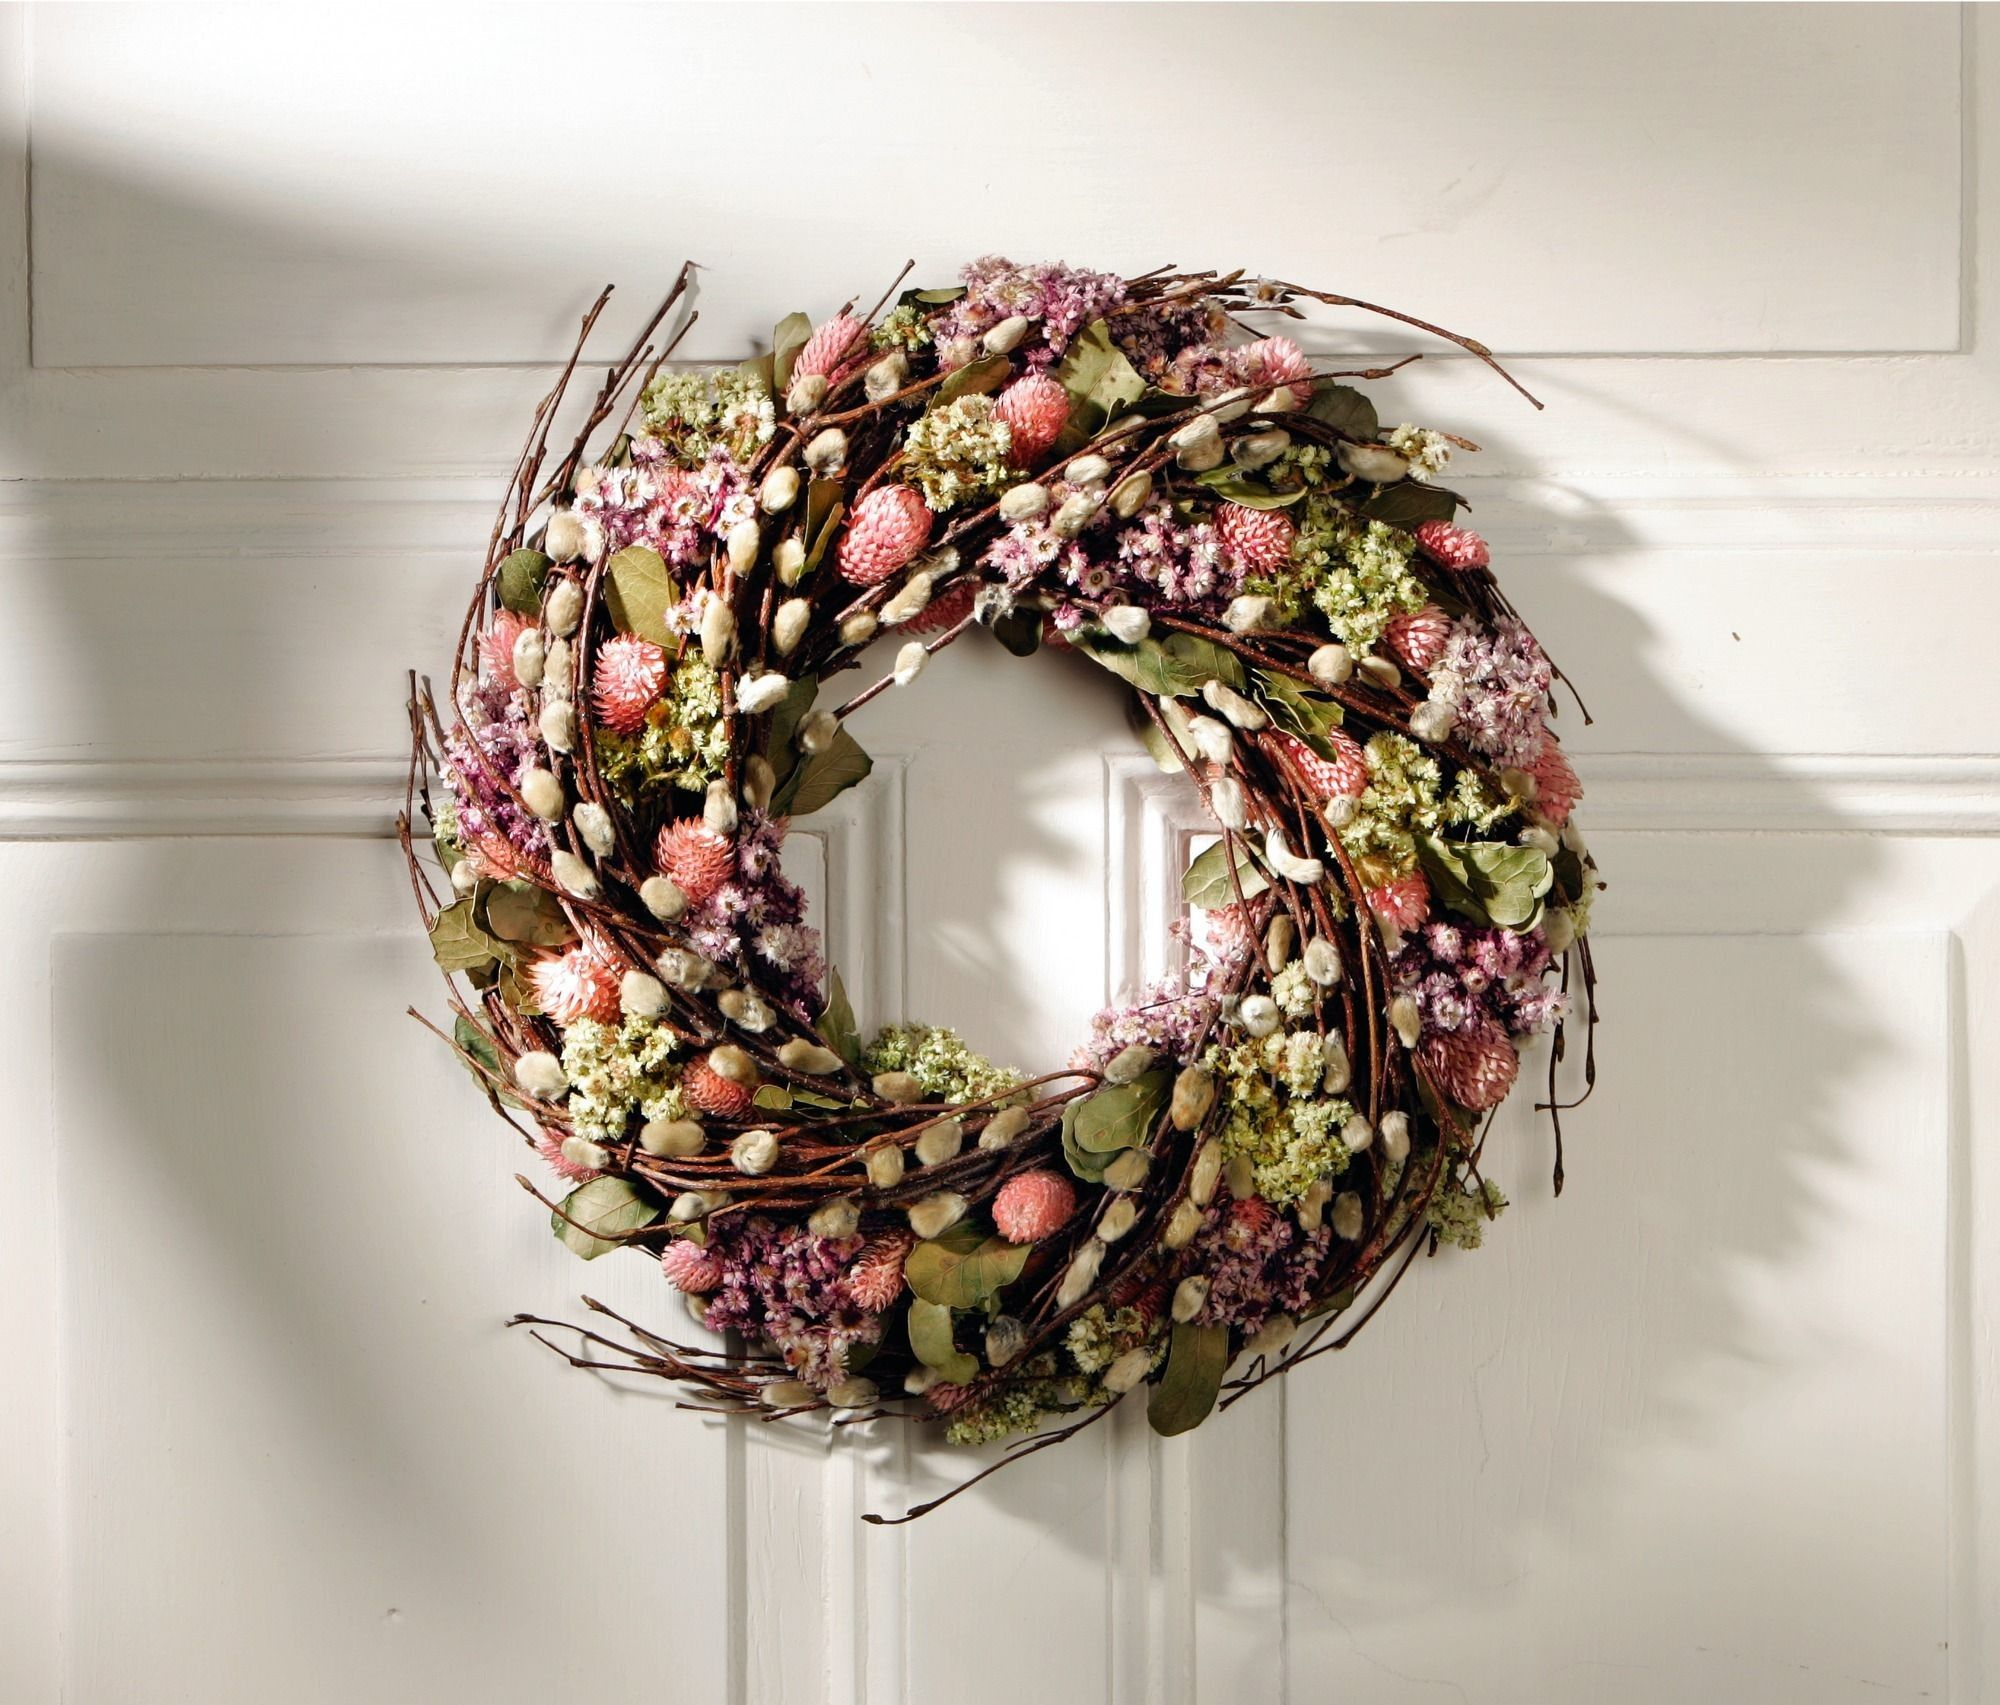 Bl tenkranz romantik kr nze deko deko ideen for Wohnung dekorieren ostern